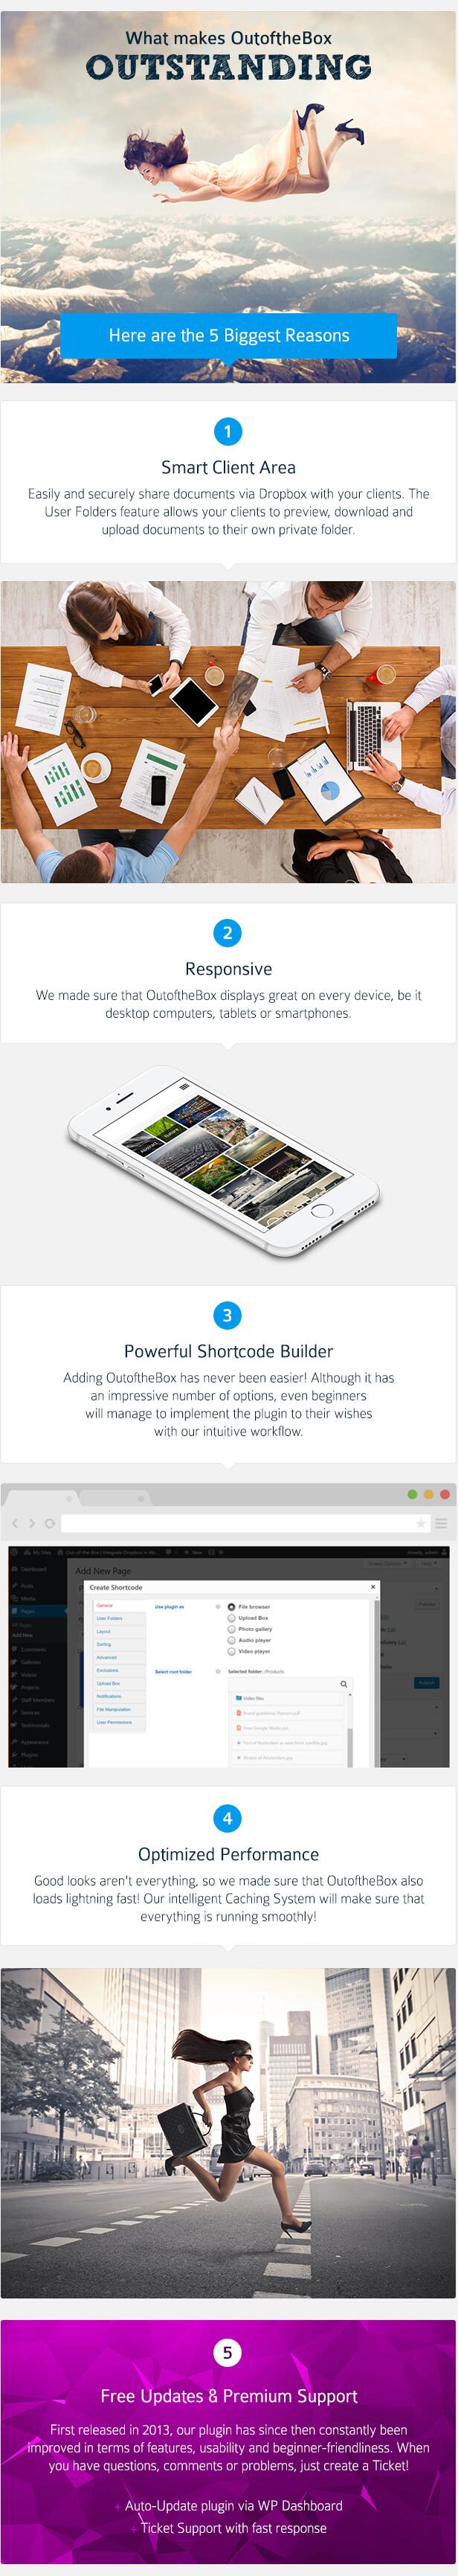 dropbox7 - Out-of-the-Box | Dropbox plugin for WordPress